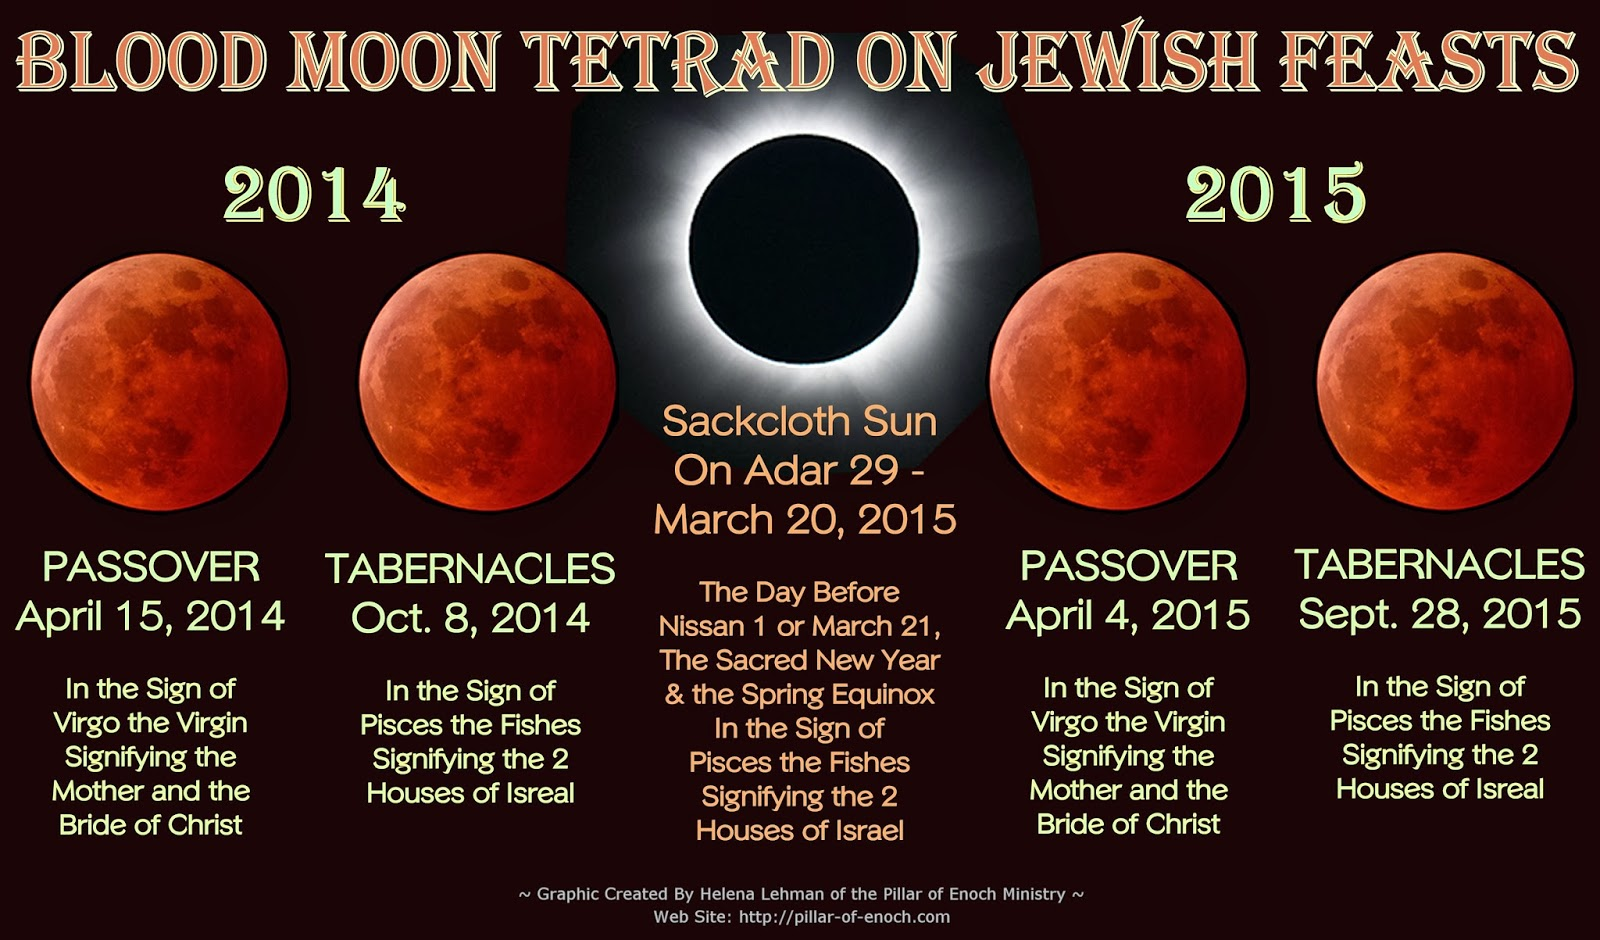 Pillar of Enoch Ministry Blog The Blood Moon Tetrad of